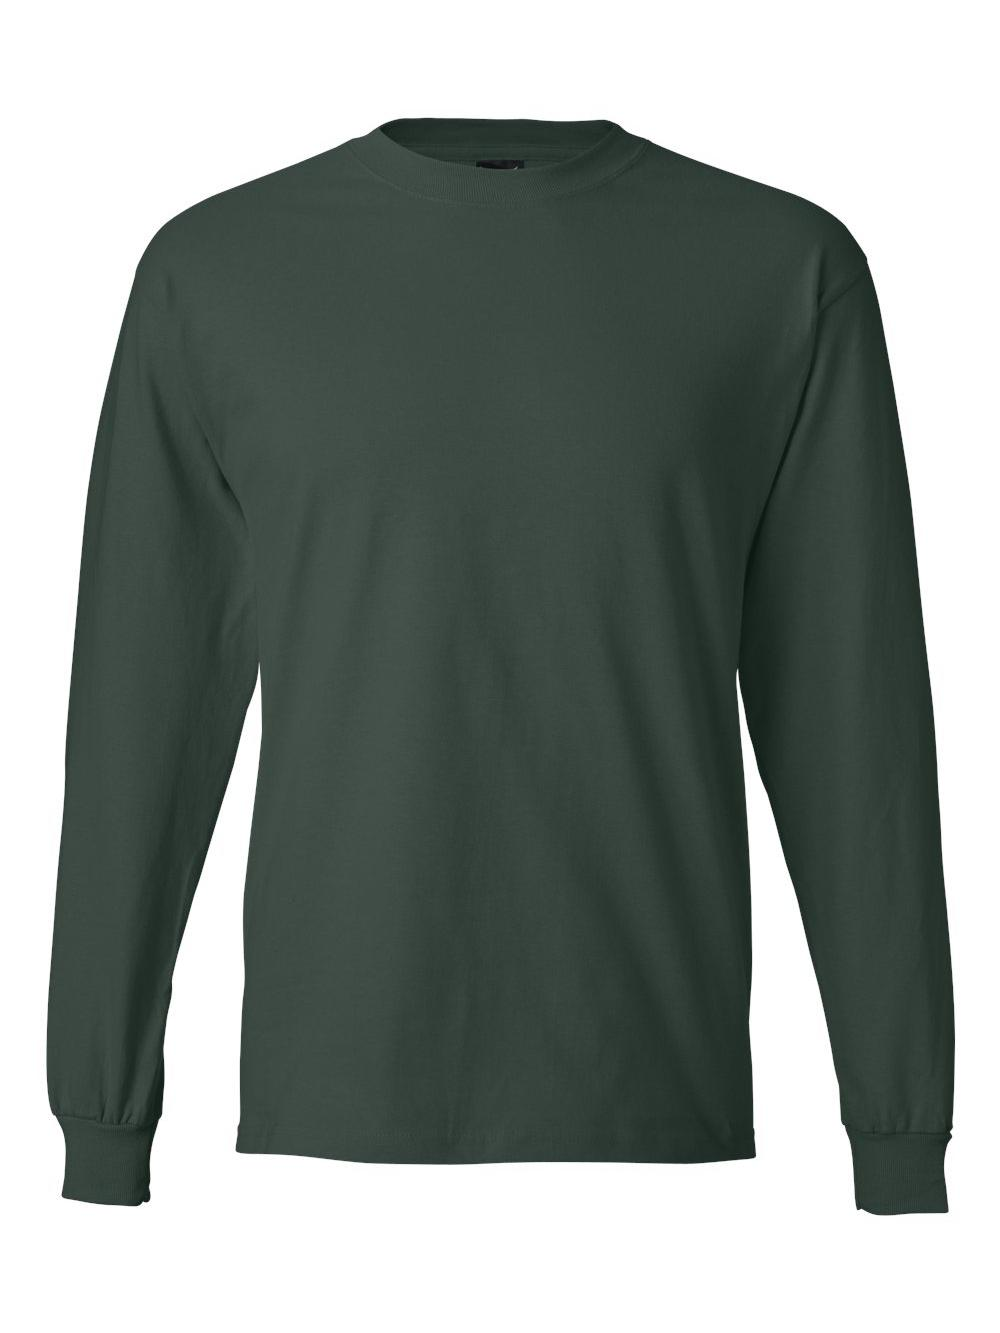 Hanes-Beefy-T-Long-Sleeve-T-Shirt-5186 thumbnail 24